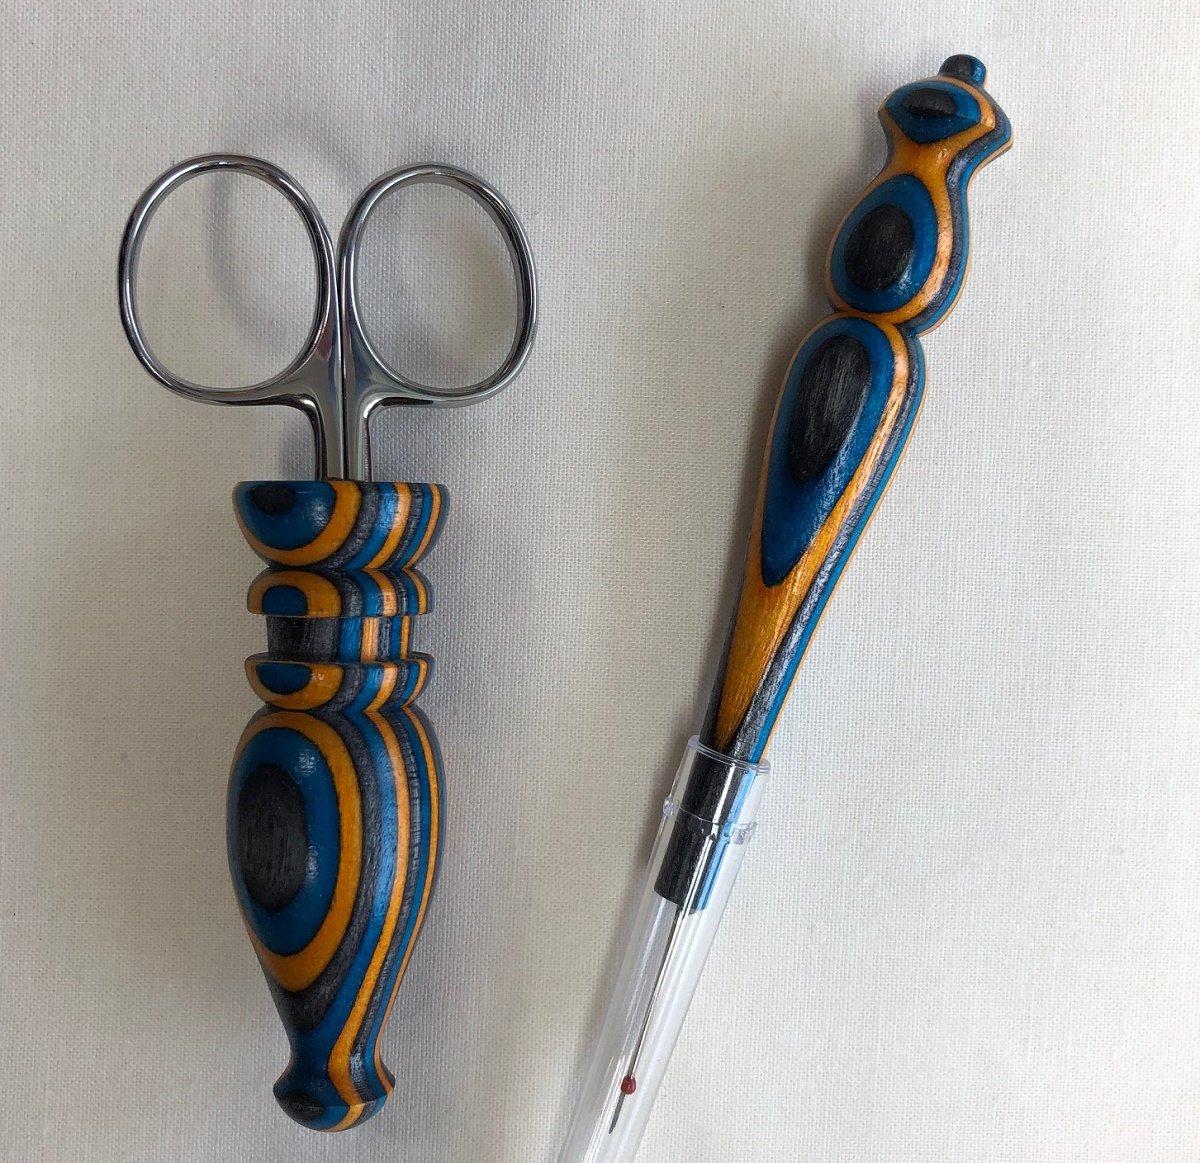 Scissor Seam Ripper Set Gold Royal W30